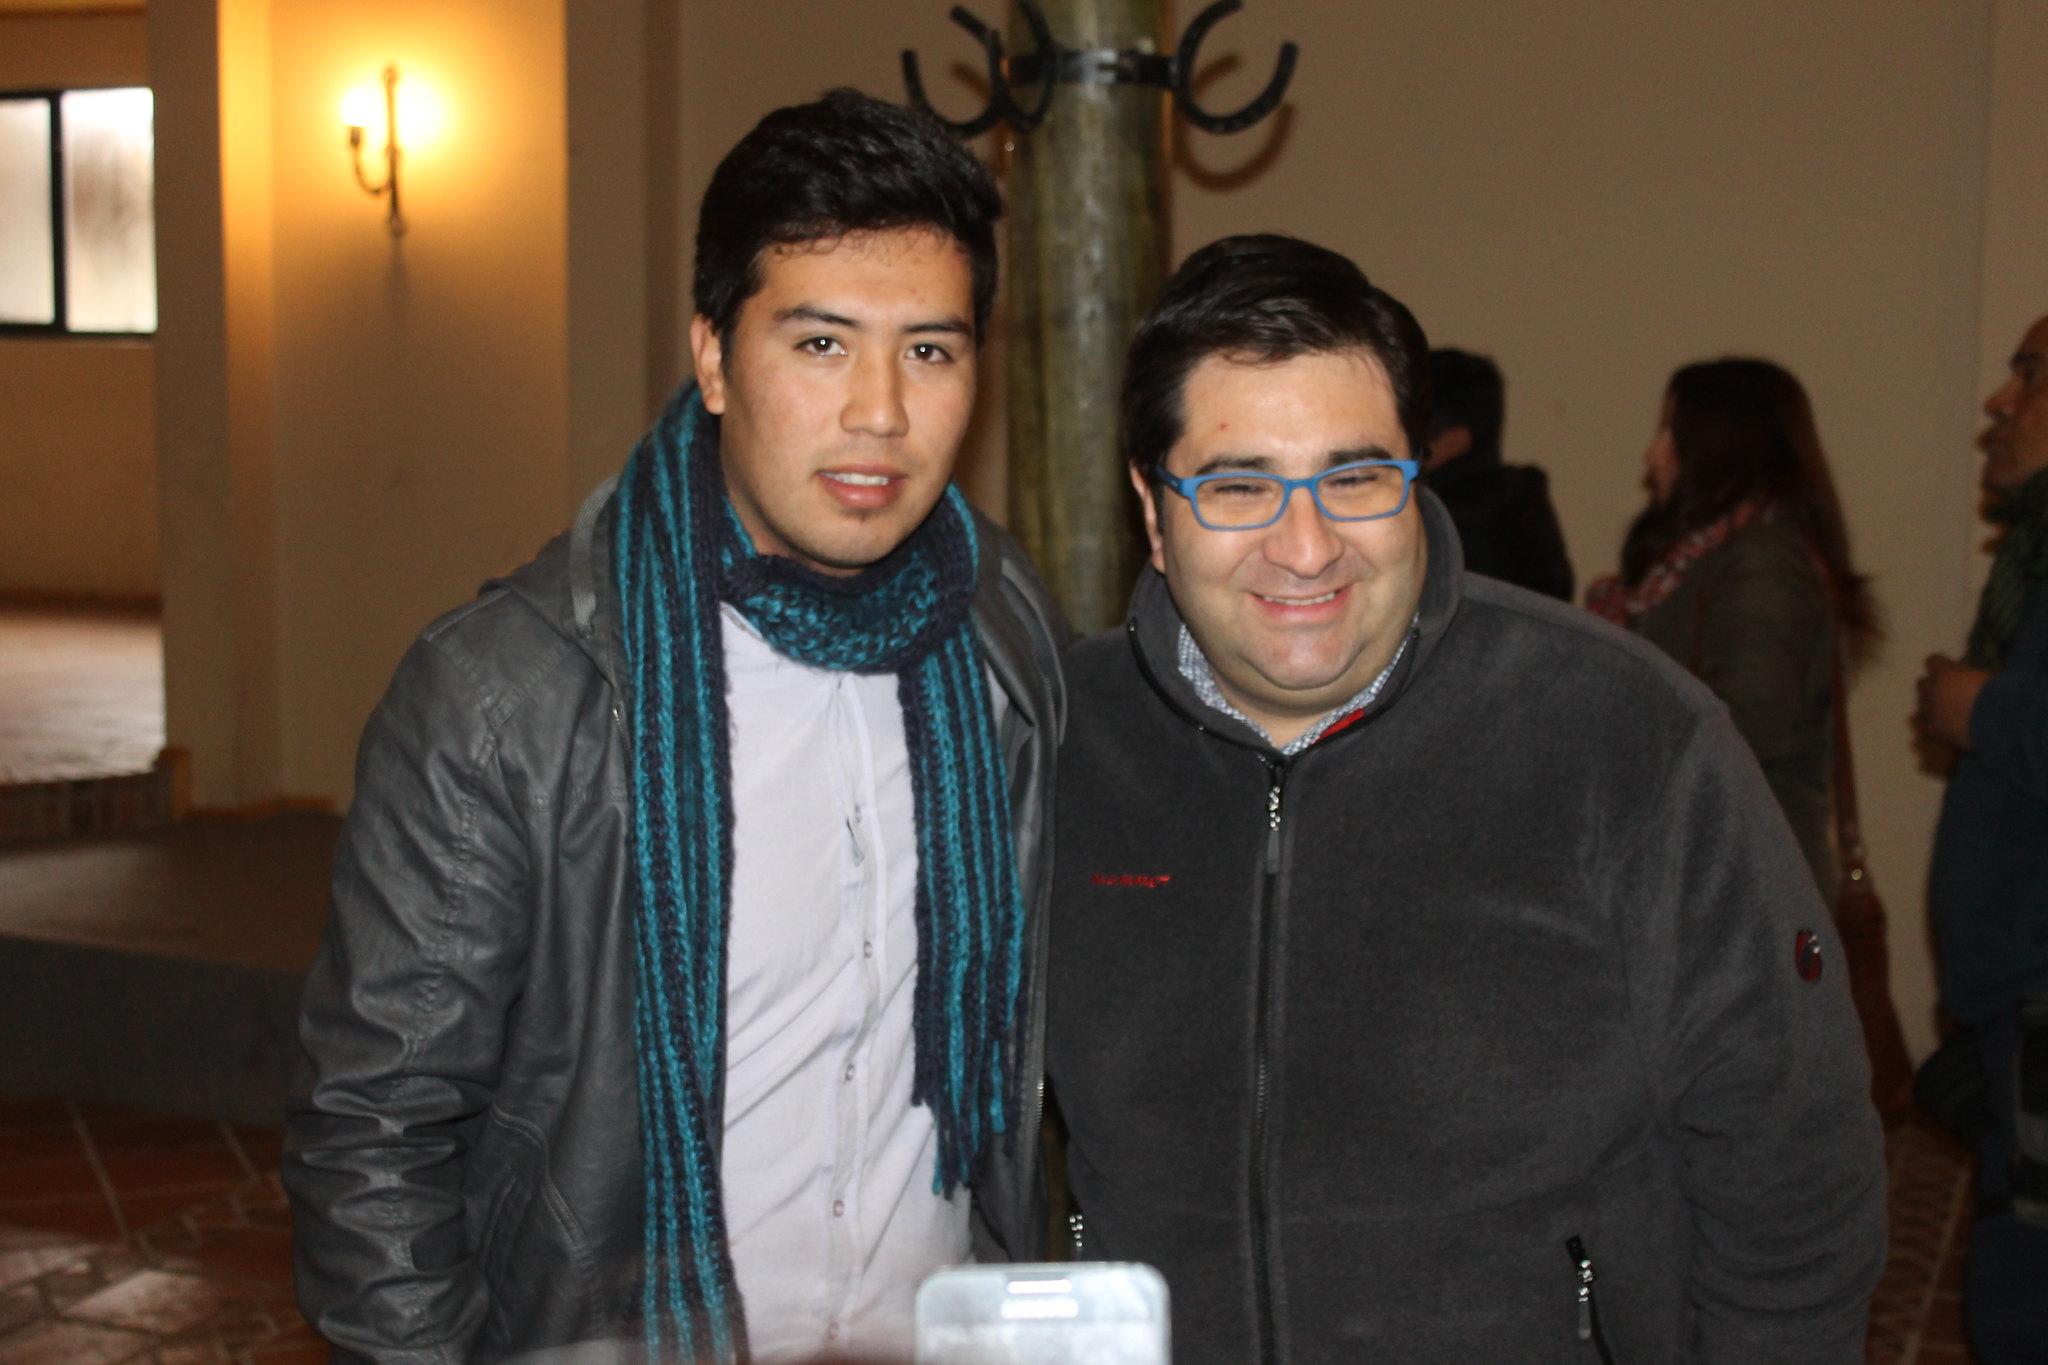 Alcalde Vásquez da nueva posibilidad de postular a Beca Municipal - 2016